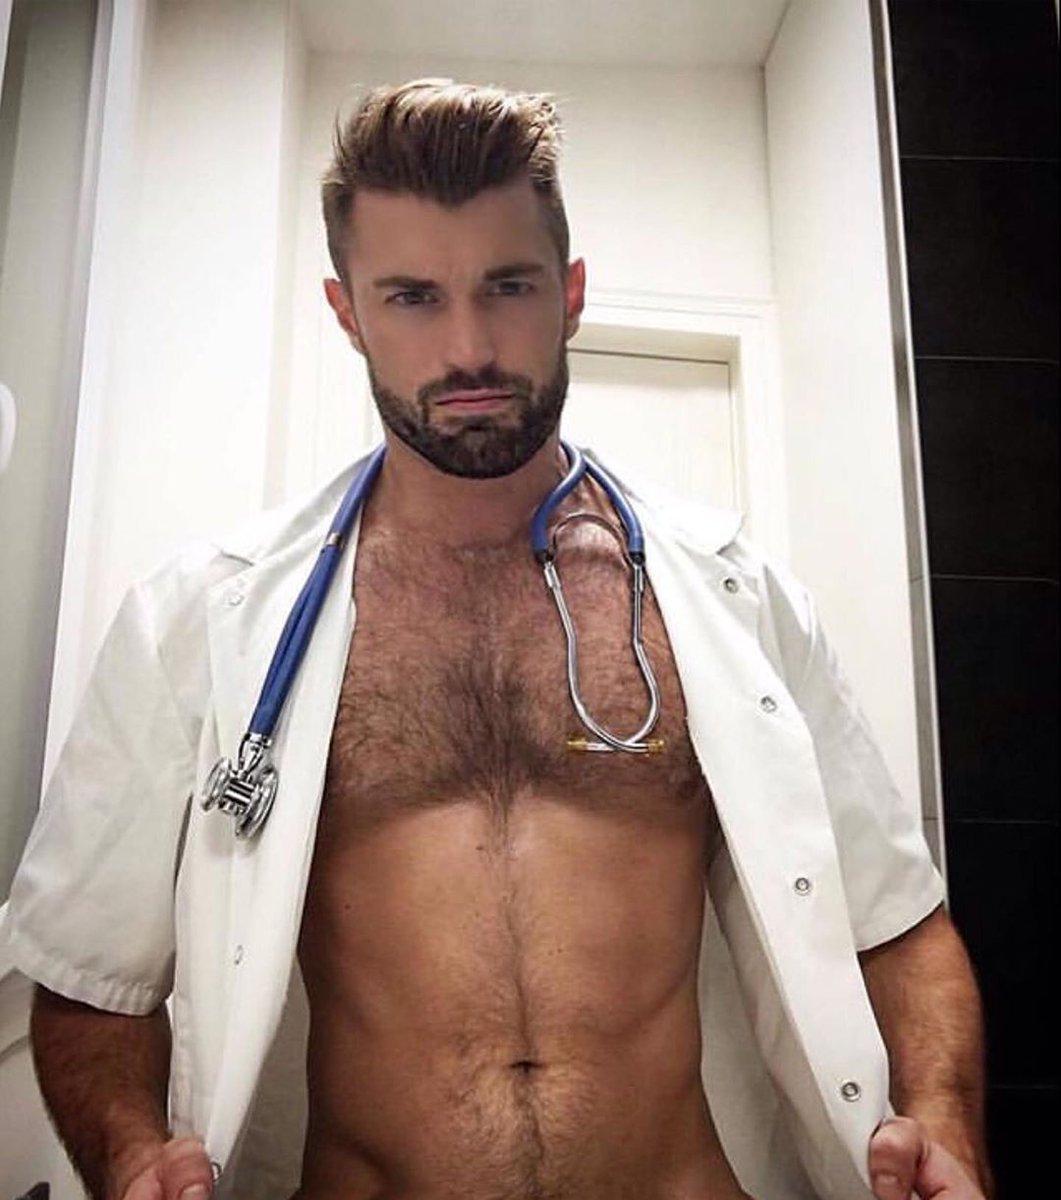 I need a Doctor @Guy_vans 😍❤💙 https://t.co/60KQ4pobsH